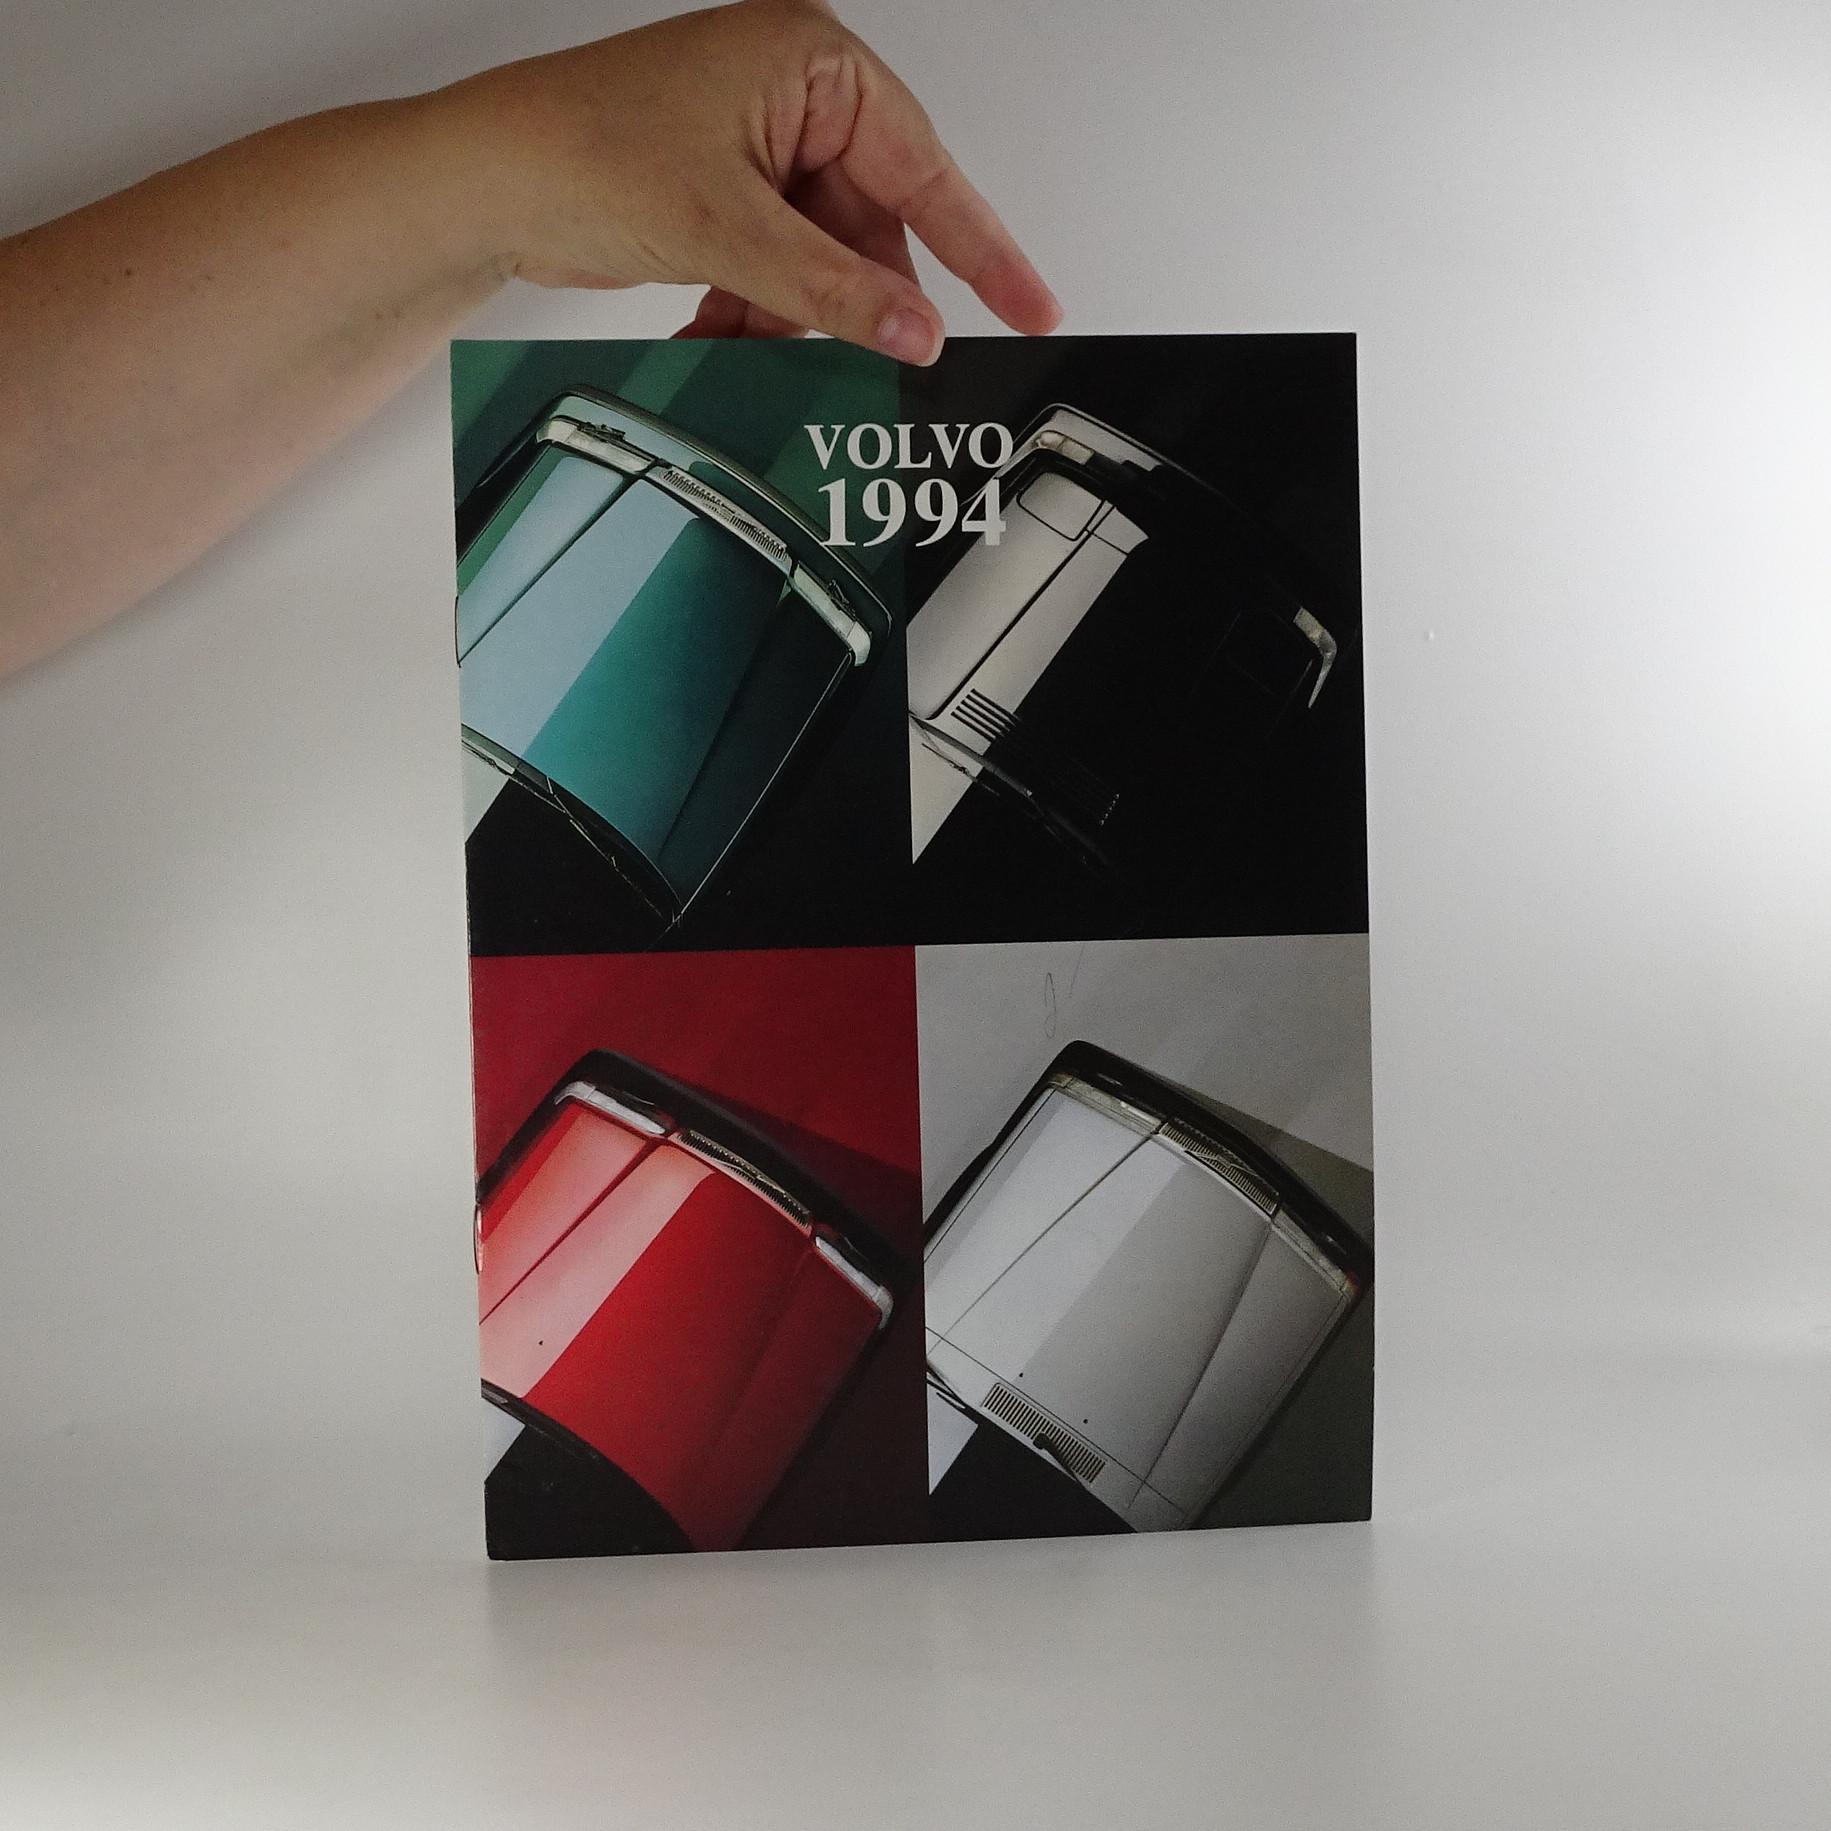 antikvární kniha Prospekt Volvo 1994, 1994